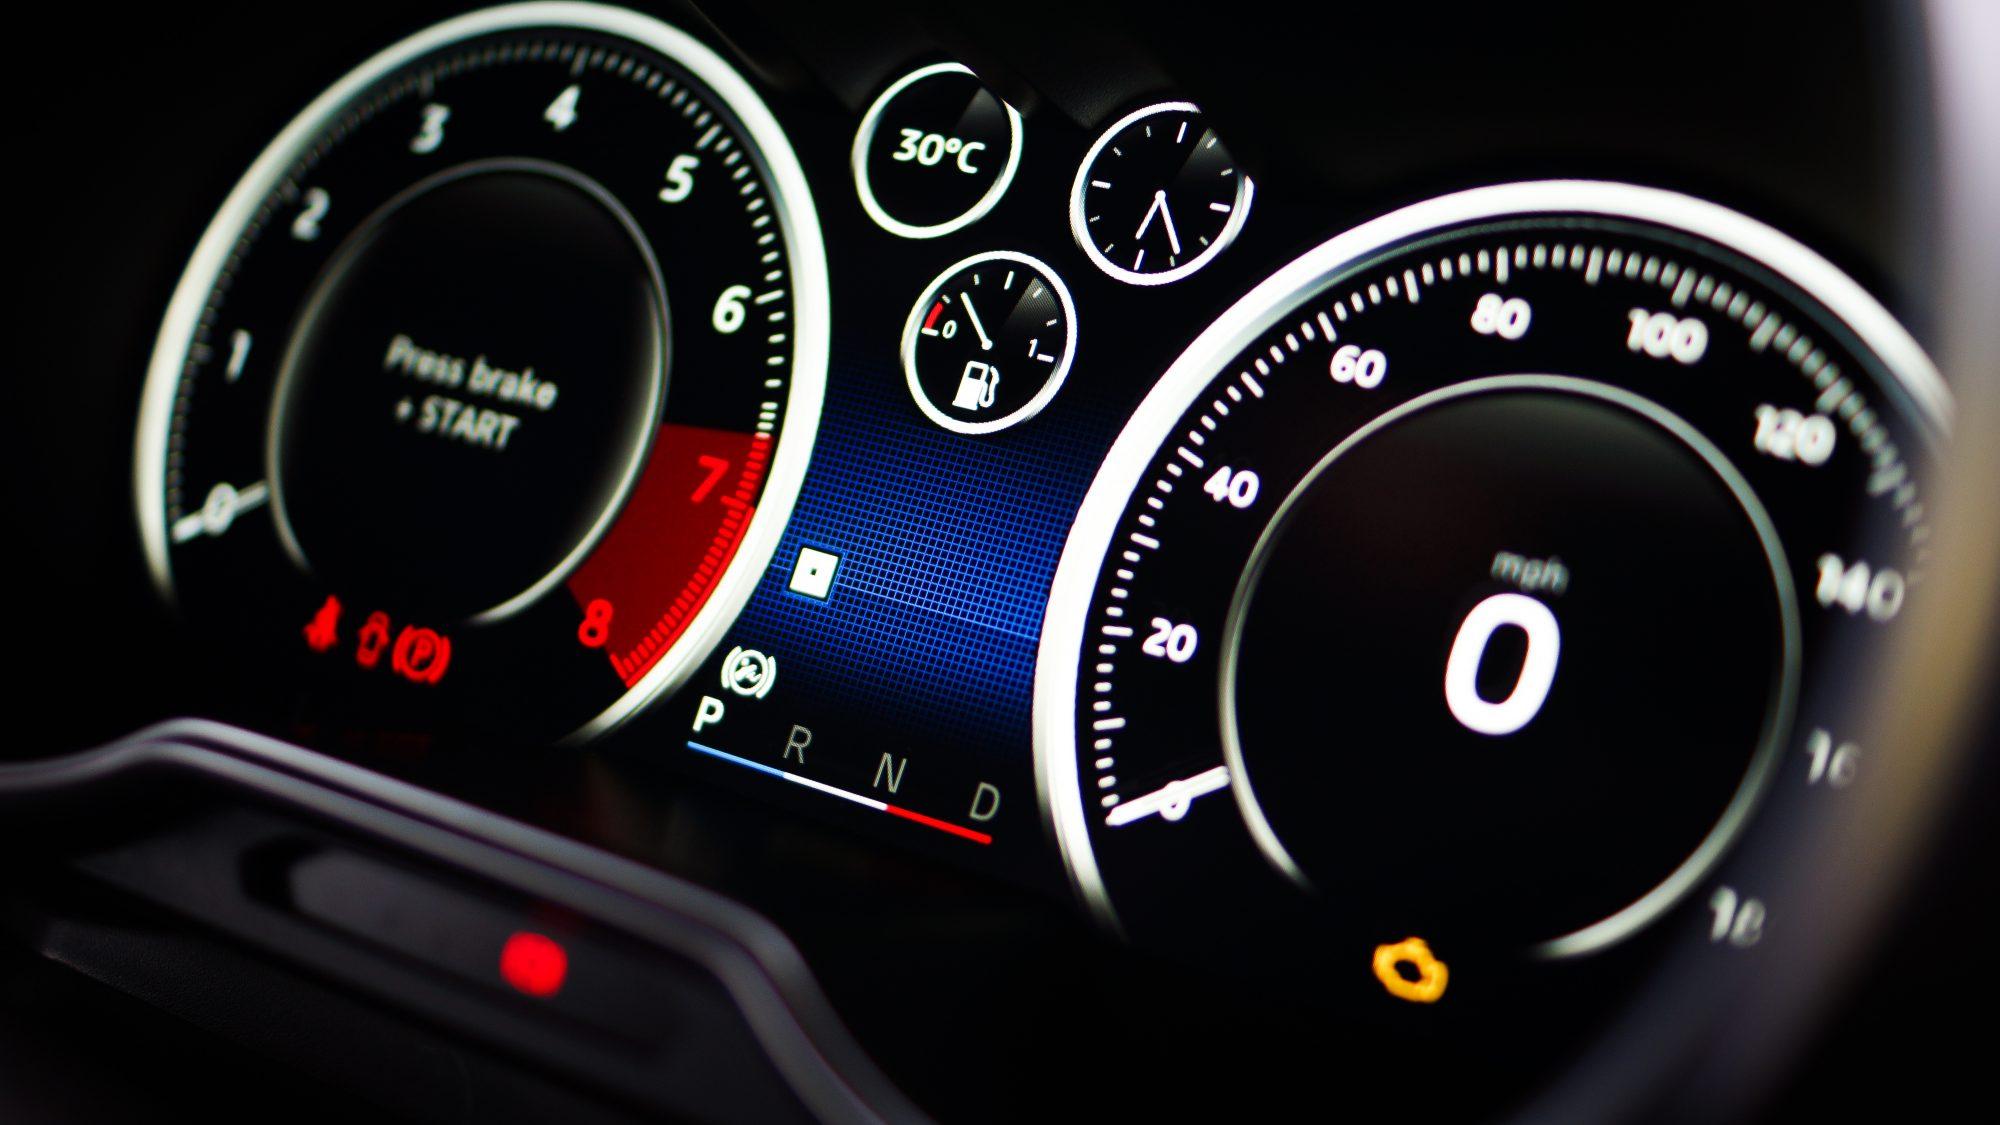 Alpine, Alpine A110, A110, Renault, turbocharged, Top Gear, sports car